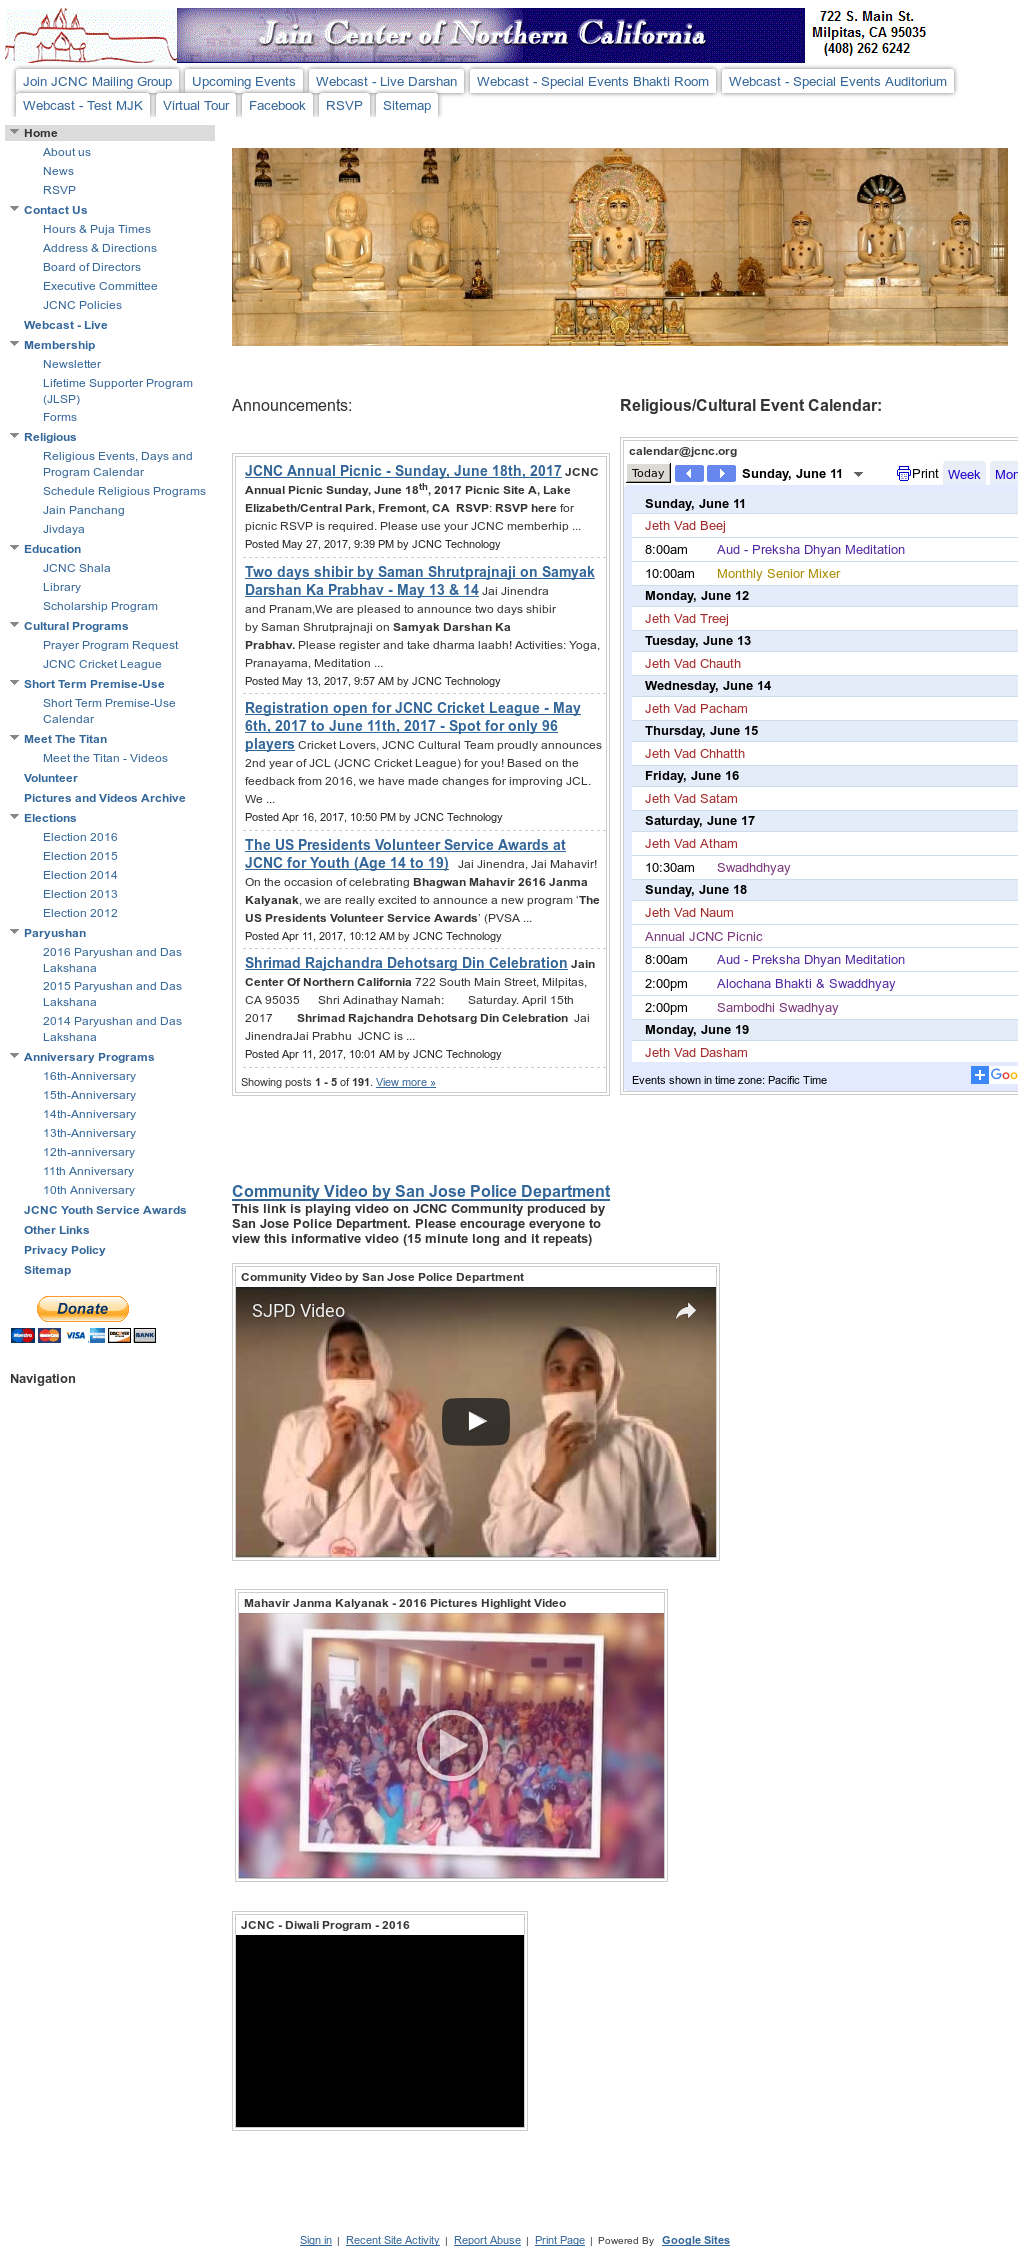 Jain Center of Northern California Competitors, Revenue and